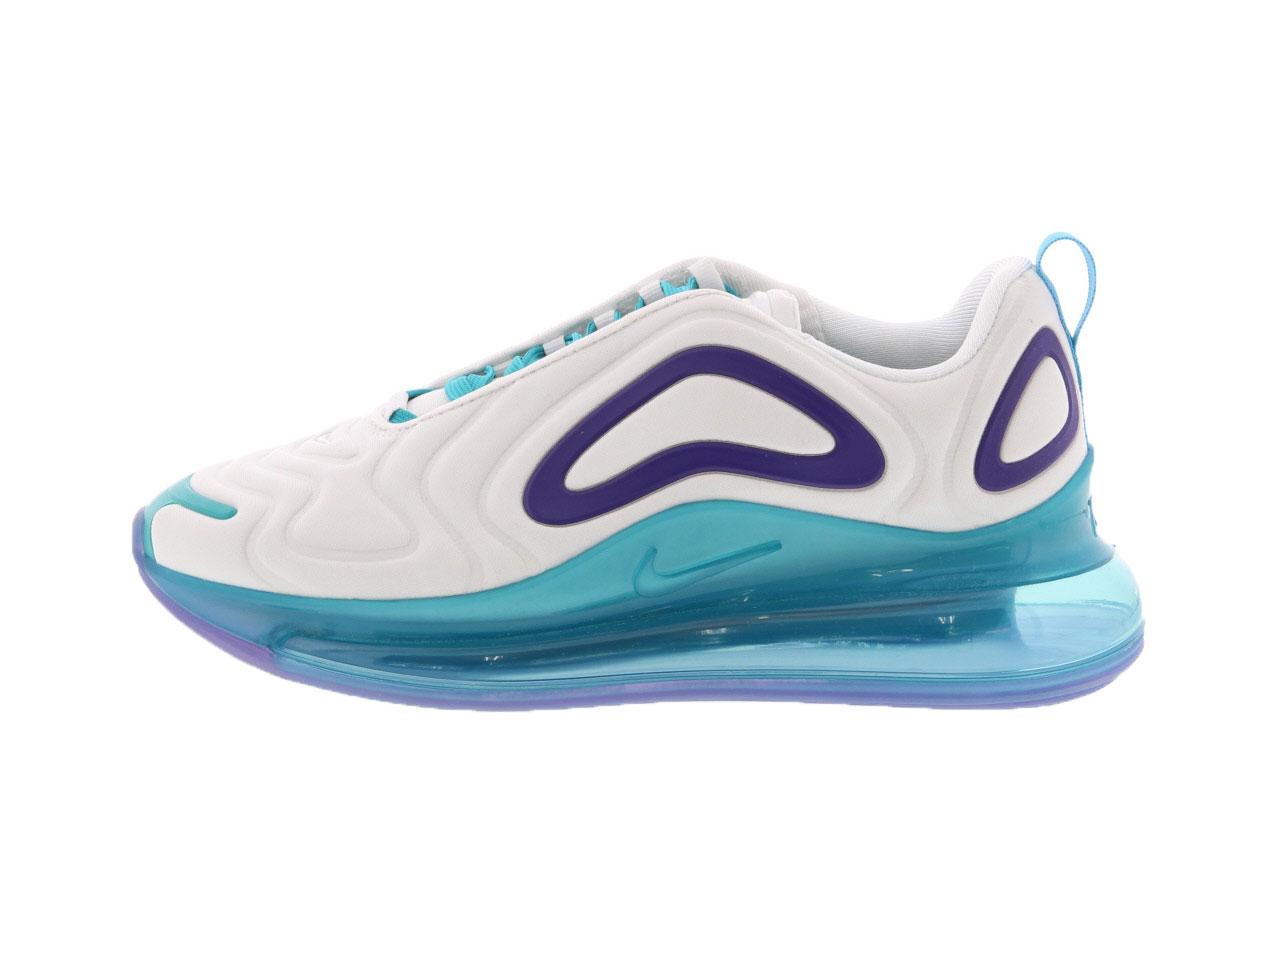 【30%OFF!】NIKE WMNS AIR MAX 720(AR9293-100)【ナイキ 羽ウィメンズ エアマックス720】【レディースファッション】【シューズ】【靴】【スニーカー】【フットウェア】